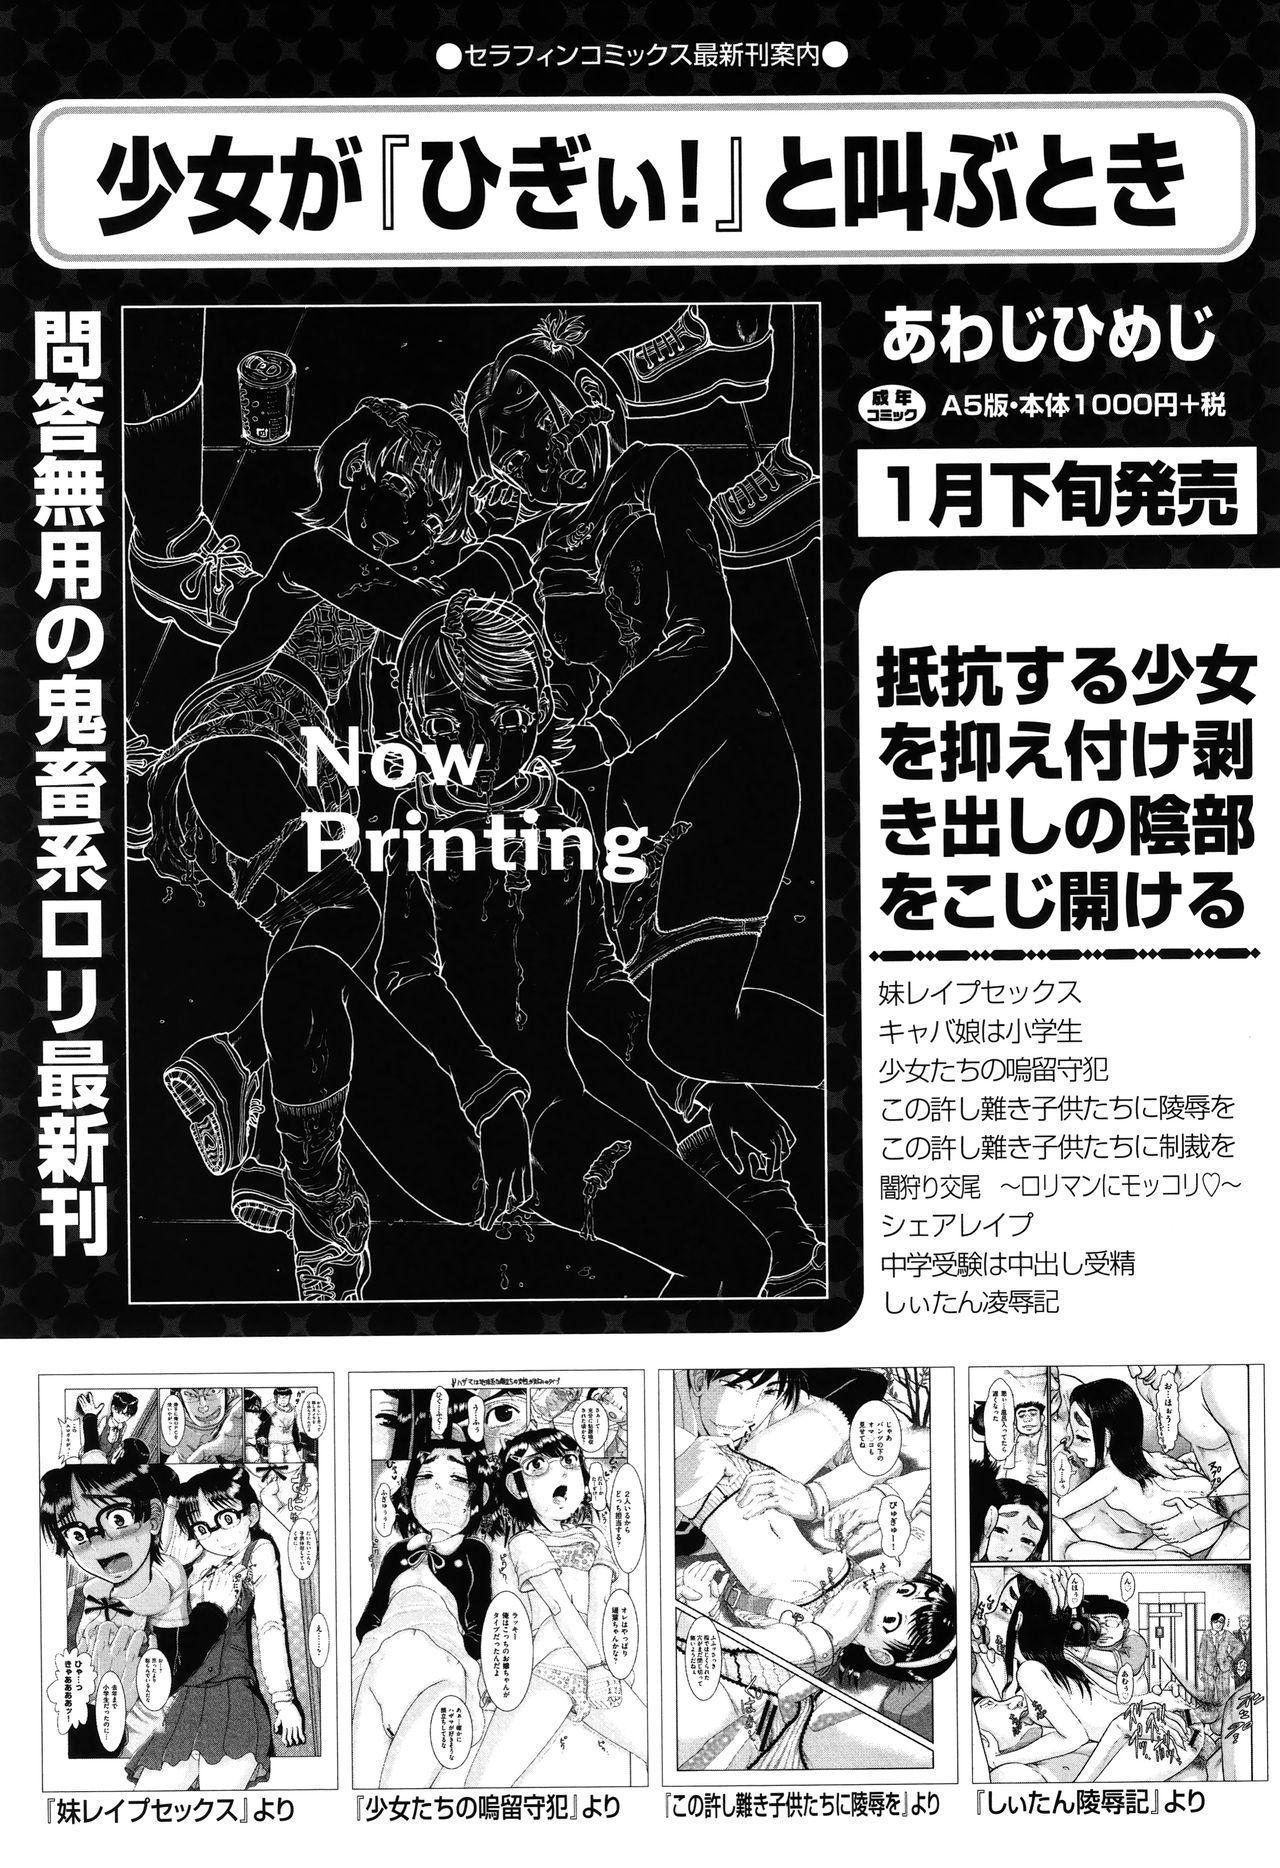 Shoujo Kumikyoku 17 109